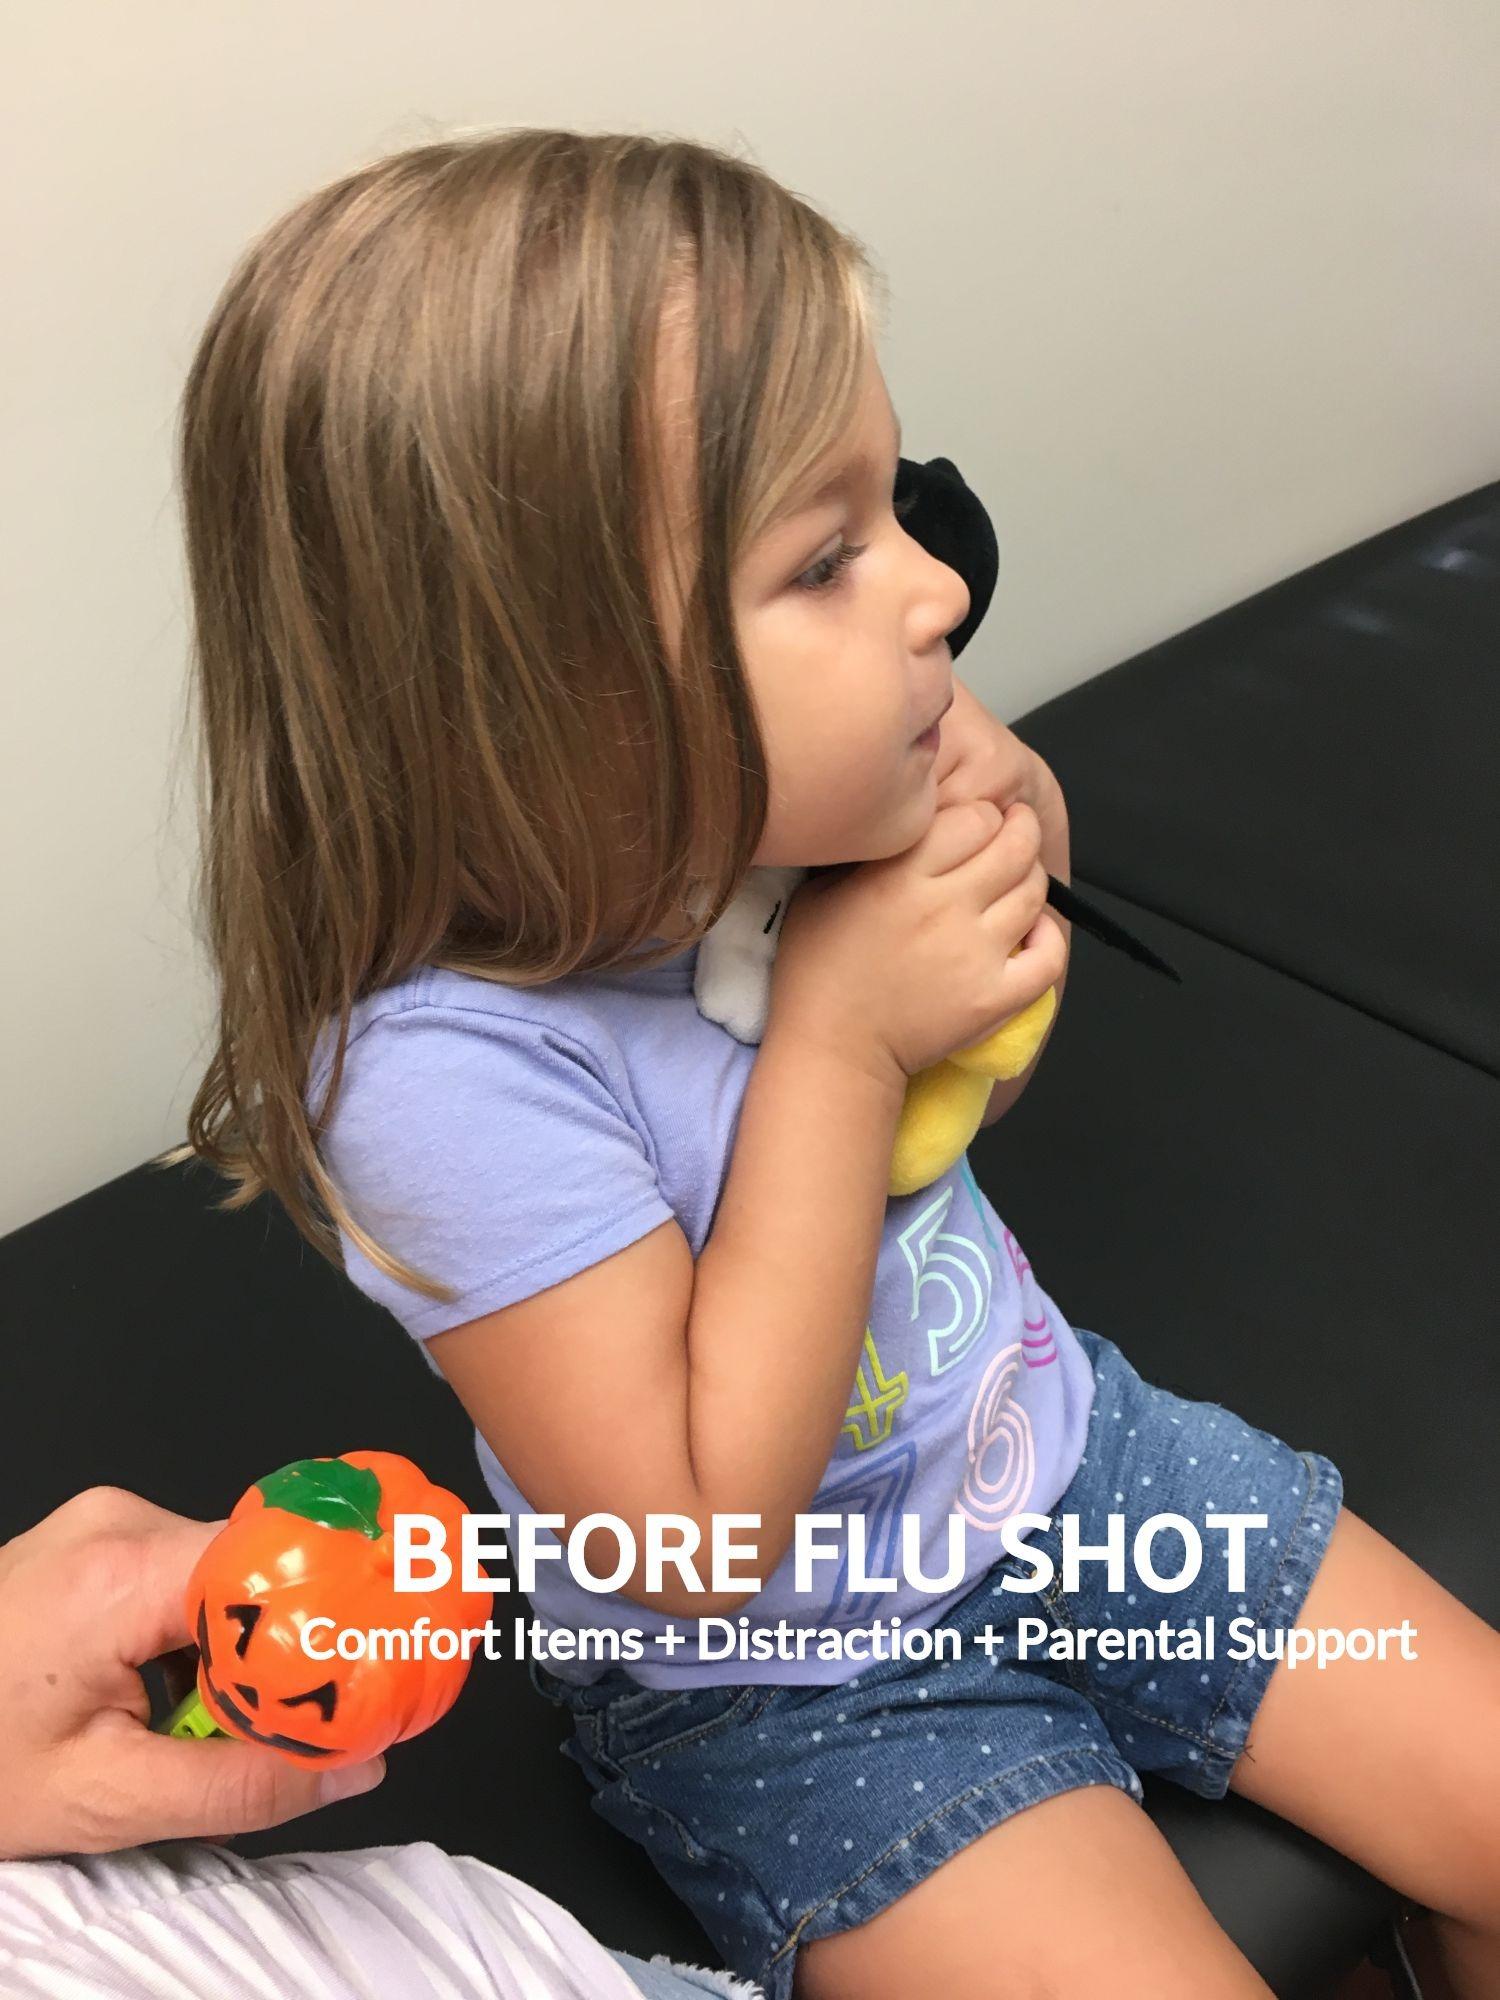 Before Flu Shot #flushot #flushotsupport #childlife #childlifespecialist #kidscoping #needlephobia #supportingkids #proceduralsupport #howtohelpkidsforflushot #flushotsupport #scaredofneedles #scaredofshots